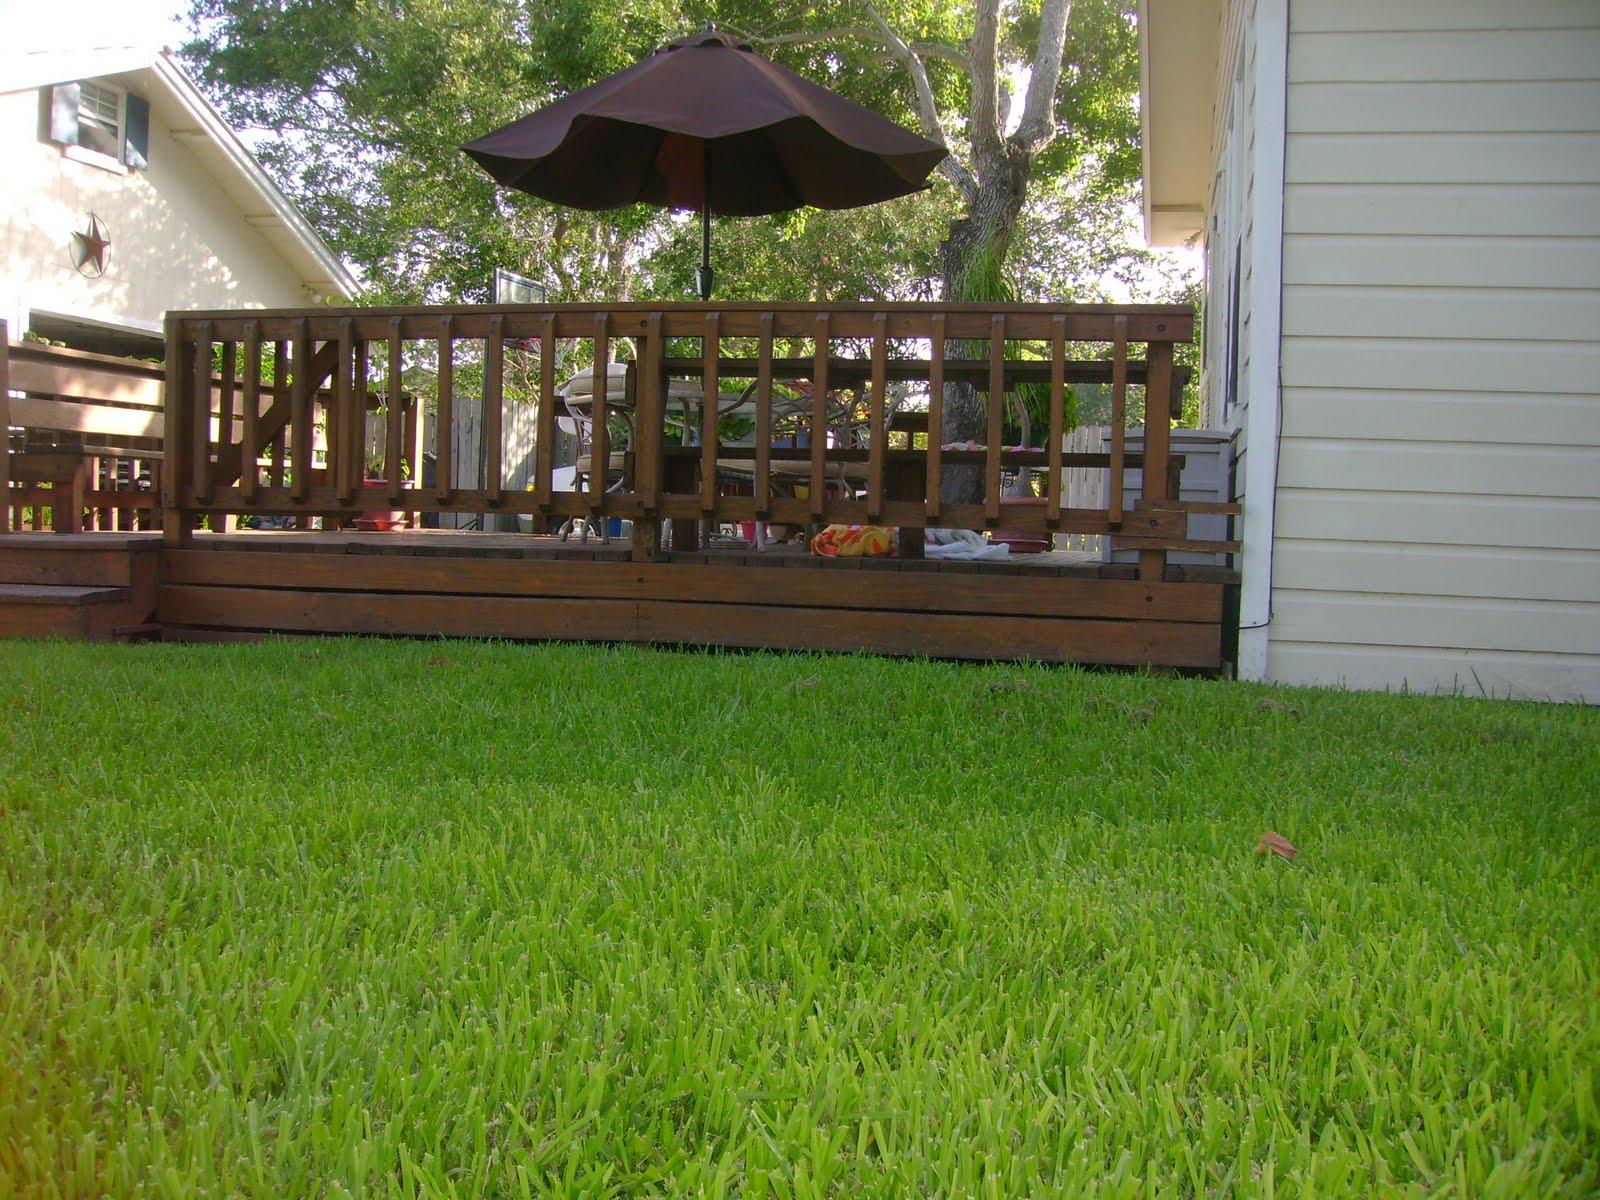 Backyard Background Images : 613 Stirman Street, 78411 More exterior pics